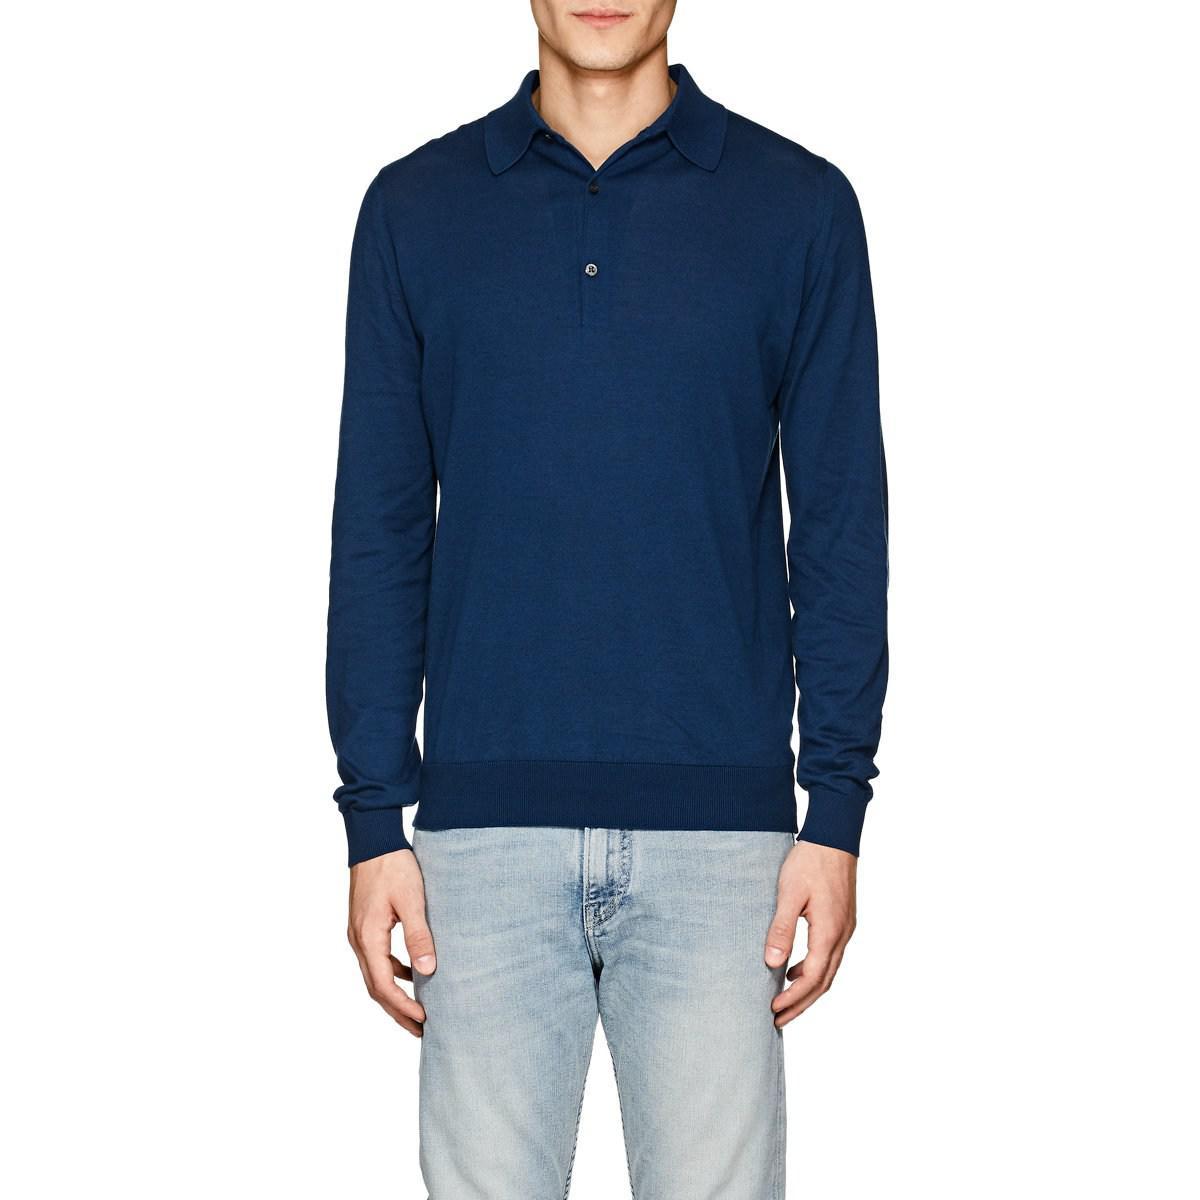 687c0dcf John Smedley Bradwell Cotton Polo Shirt in Blue for Men - Lyst